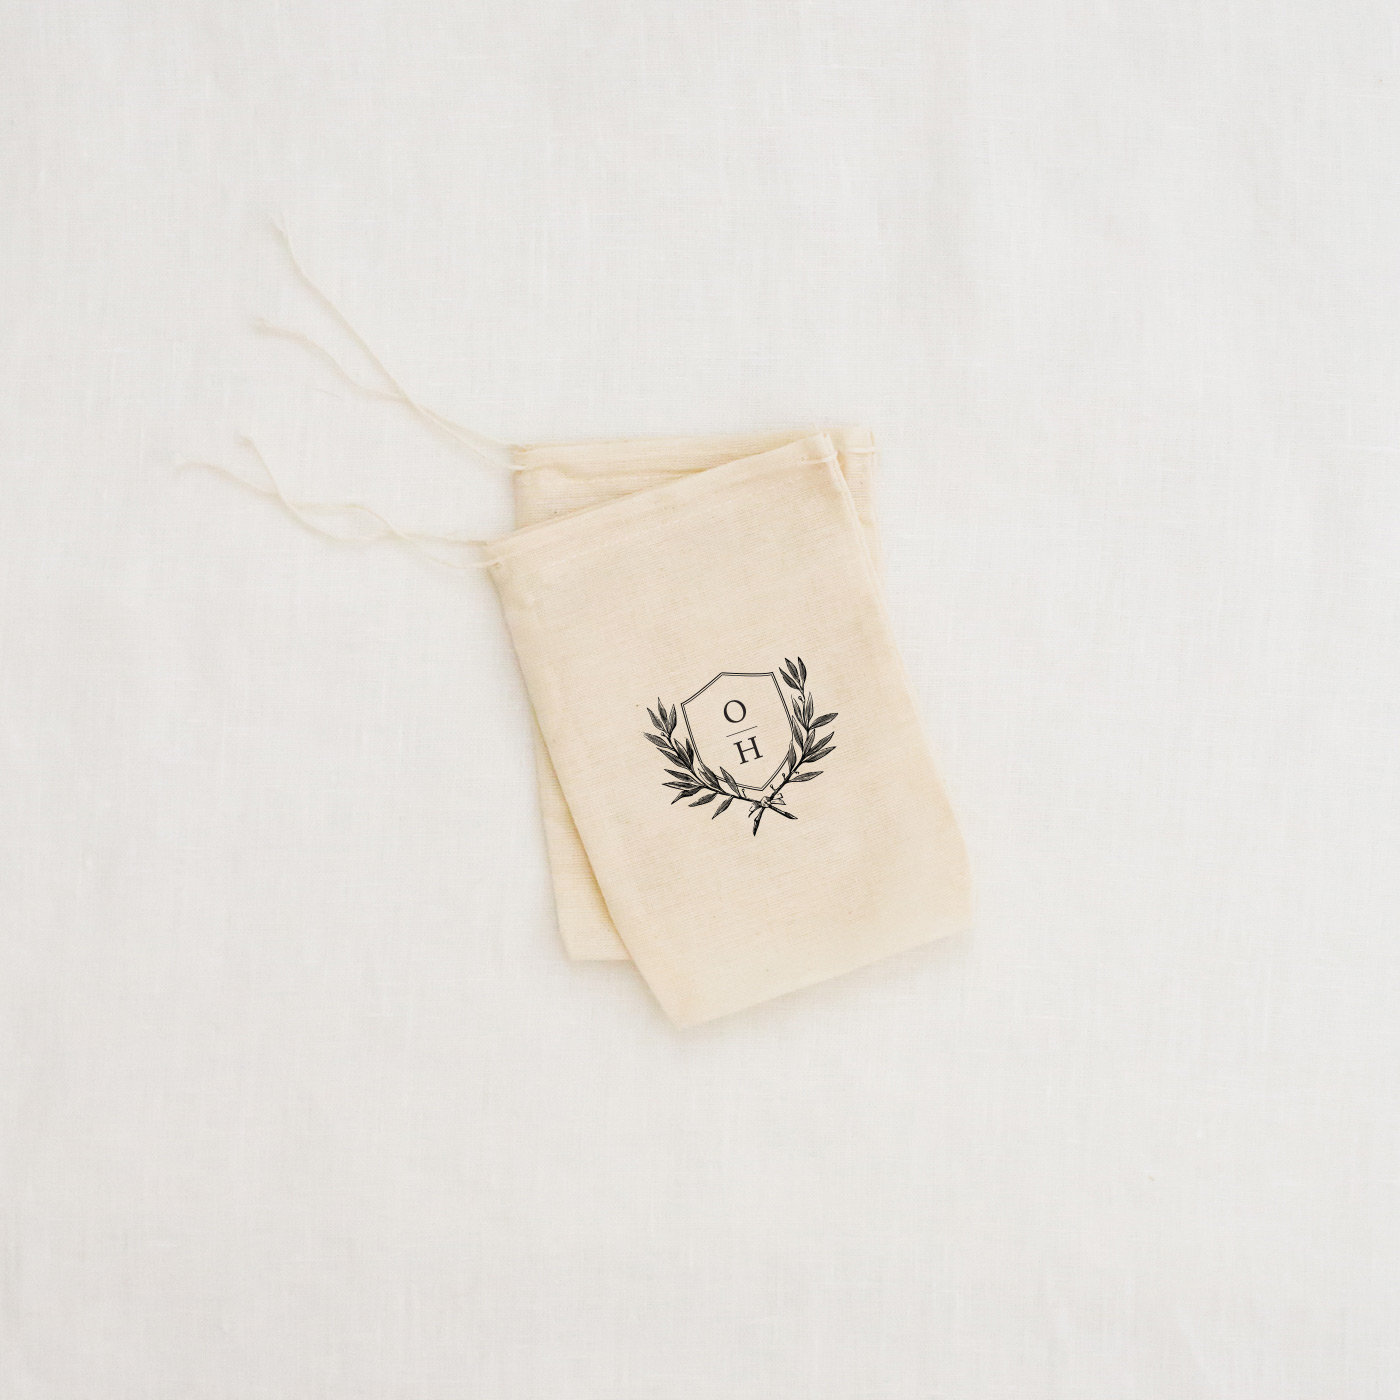 pair-monogram-return-address-gift-bog-stamp-napkin-simple.jpg